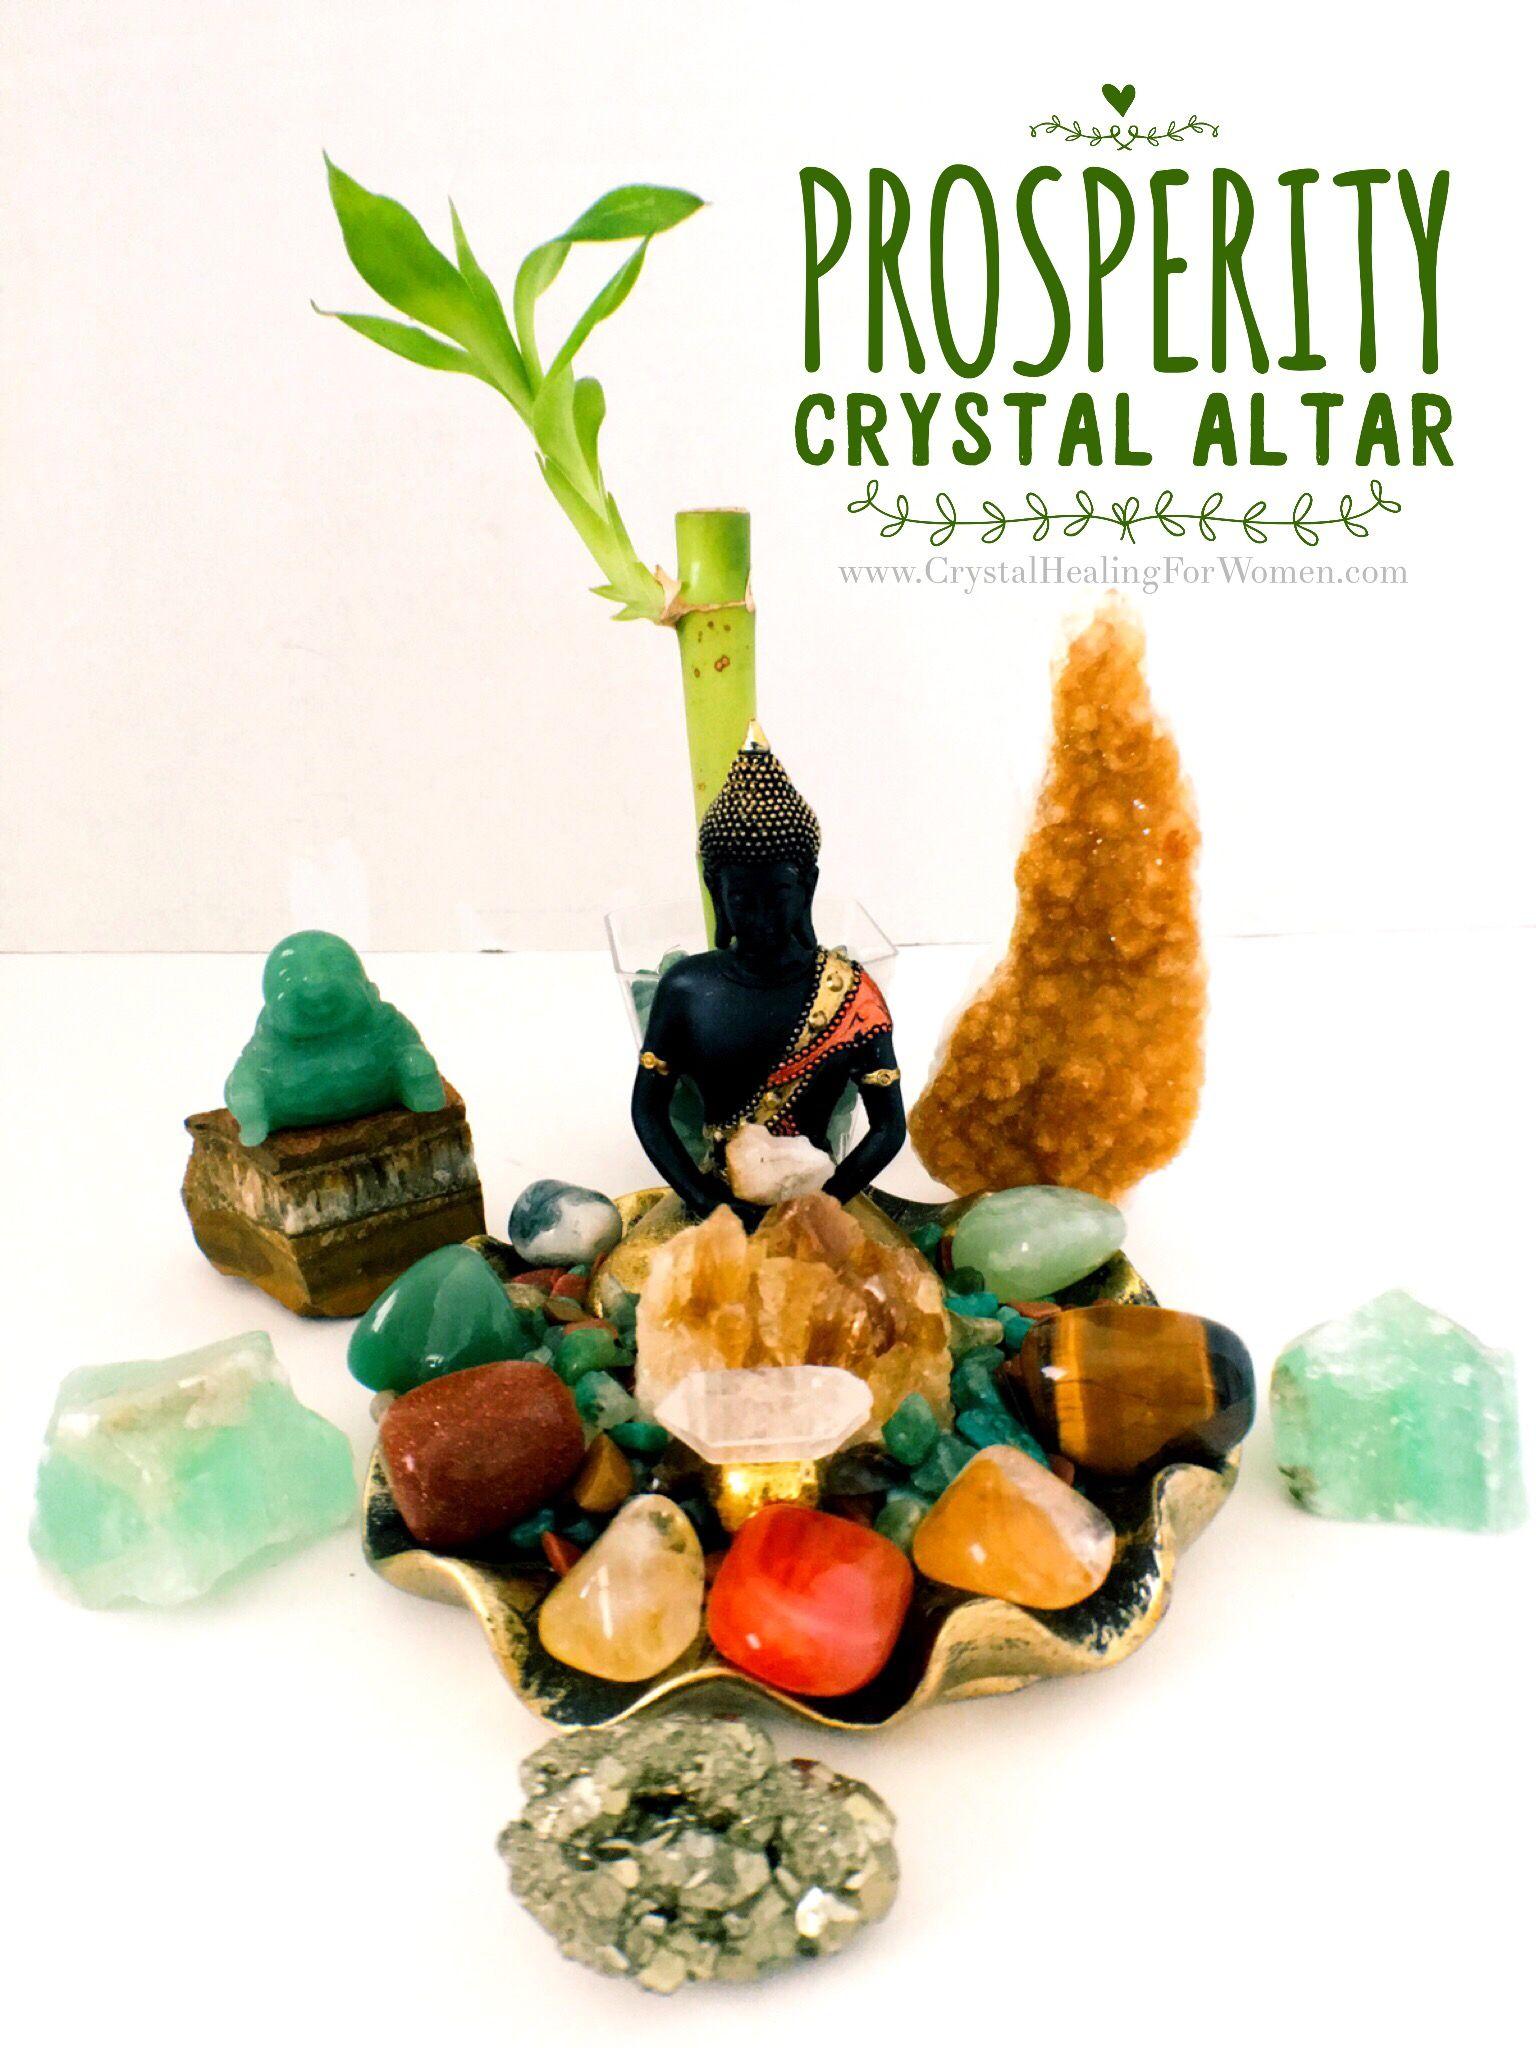 Prosperity crystal altar aventurine buddha feng shui prosperity prosperity crystal altar aventurine buddha feng shui prosperity crystals check other crystal altars reviewsmspy